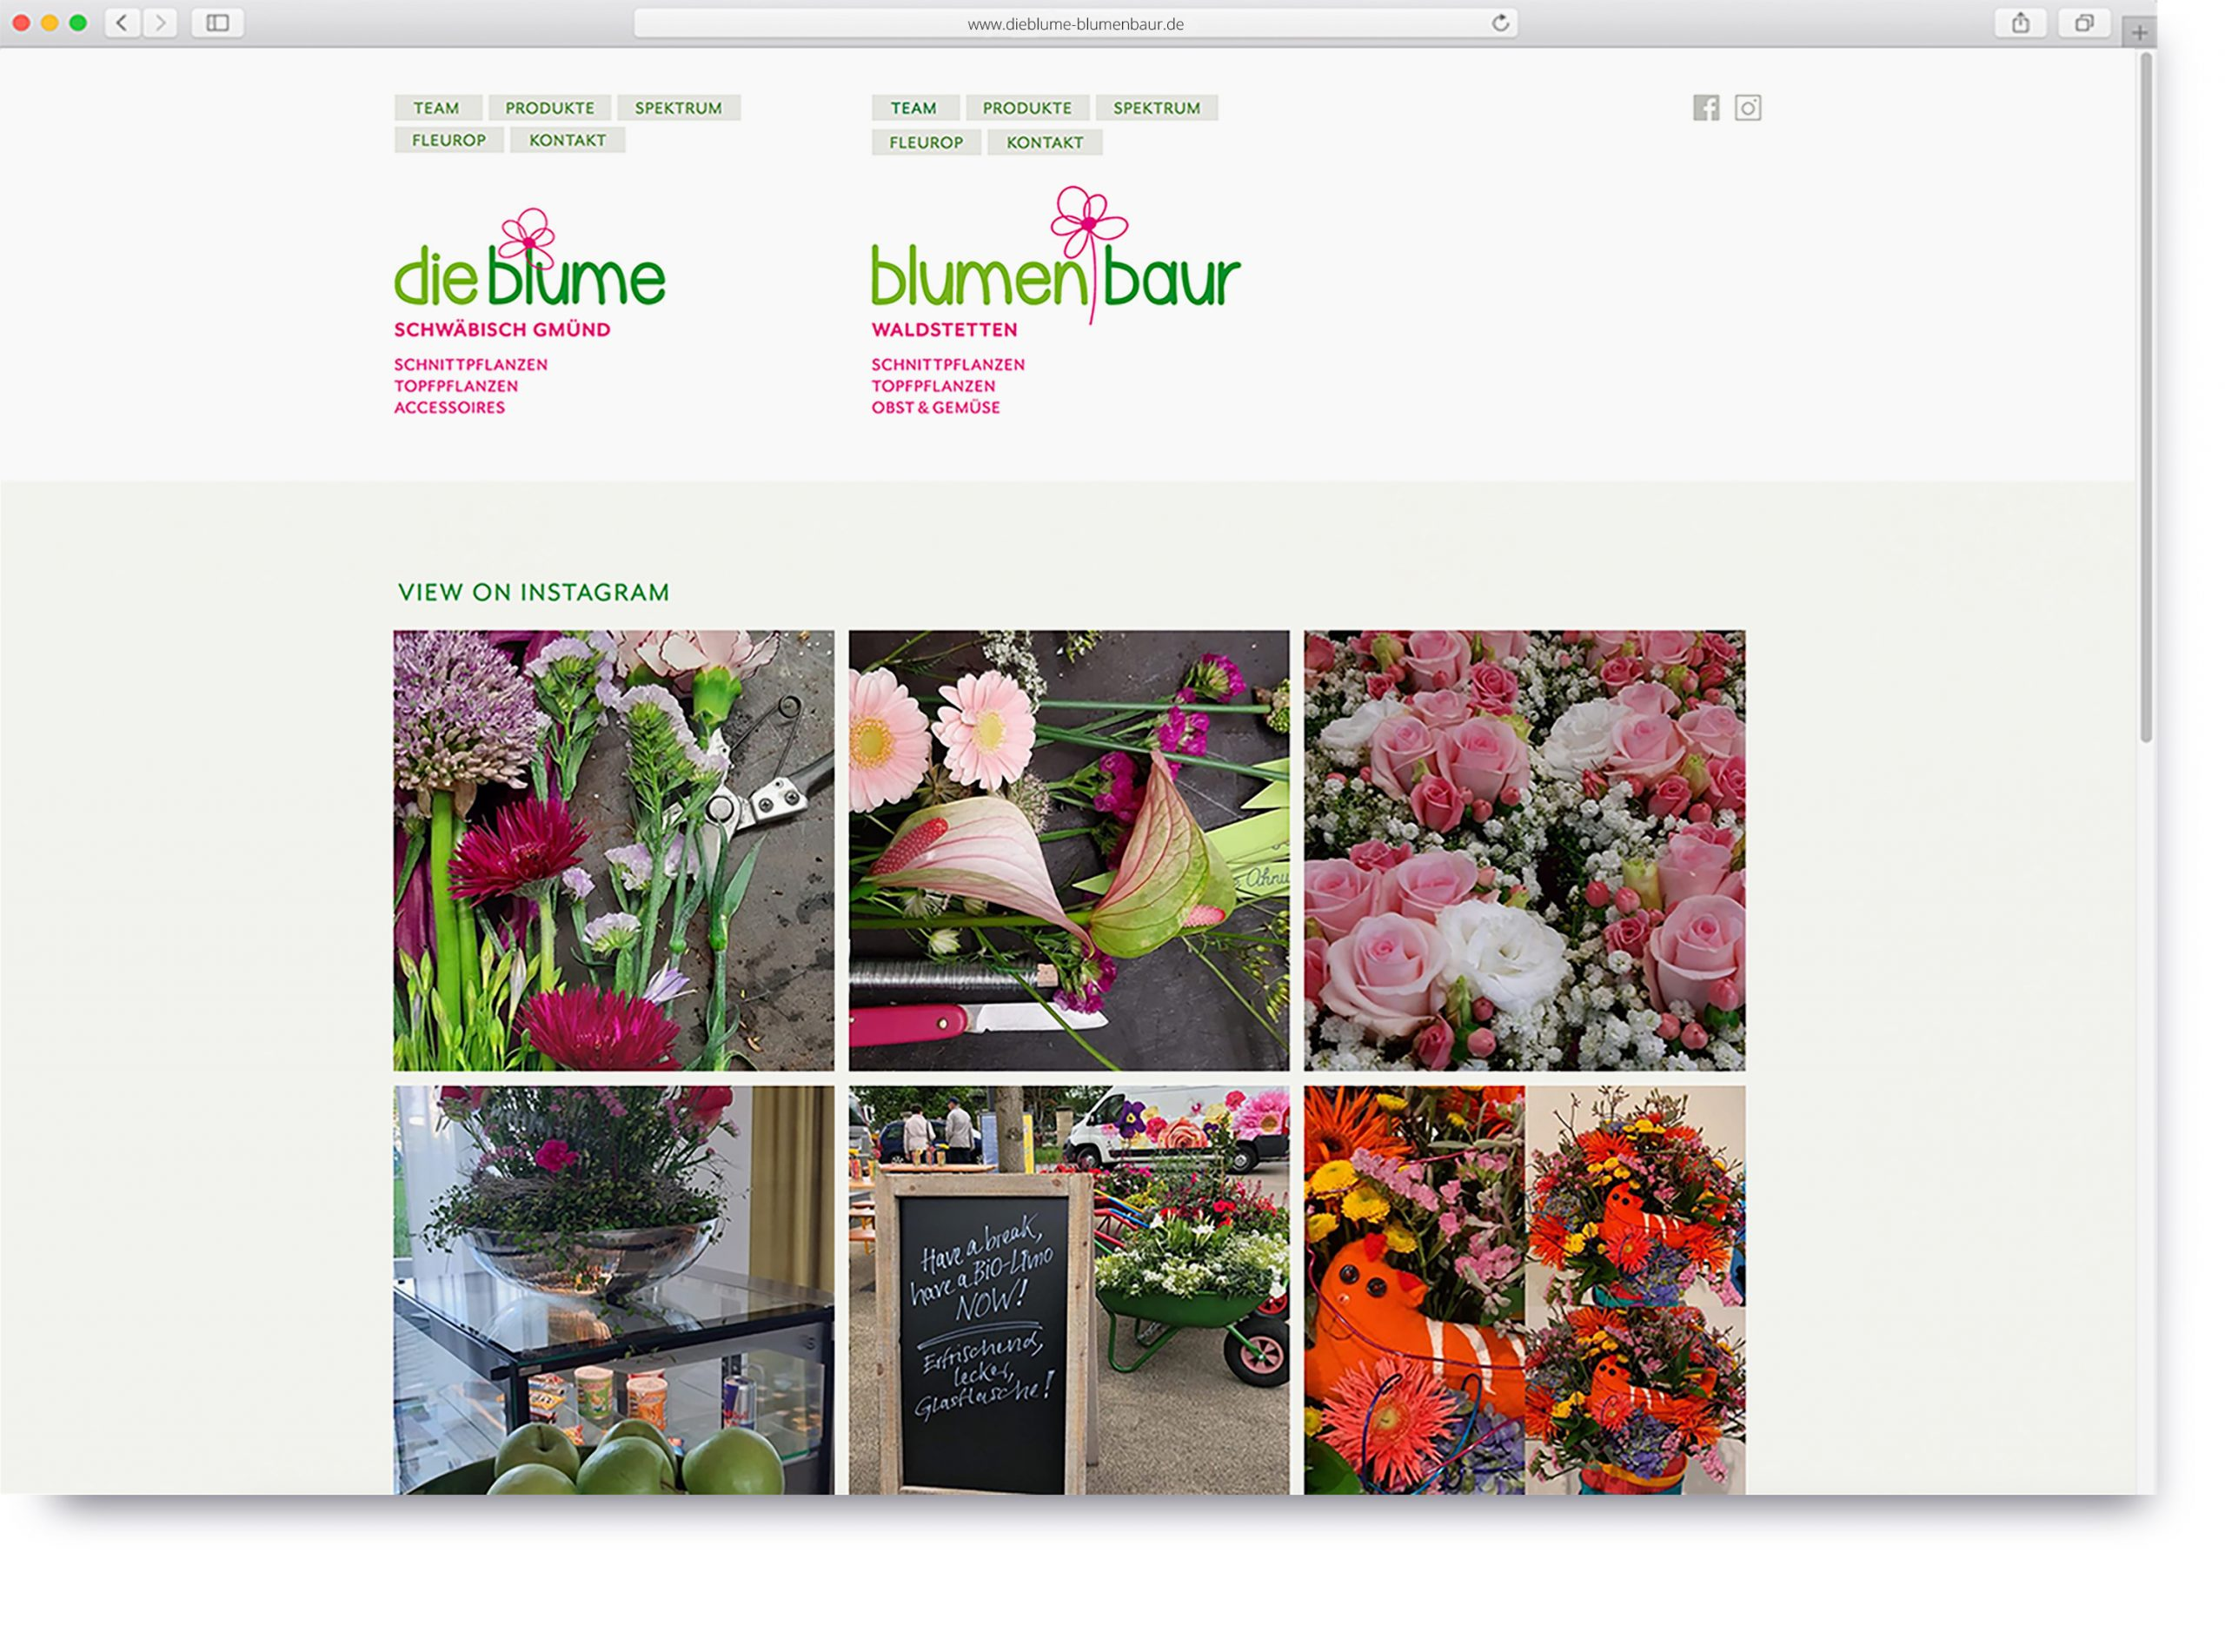 dieblume-blumenbaur-website-1-scaled.jpg